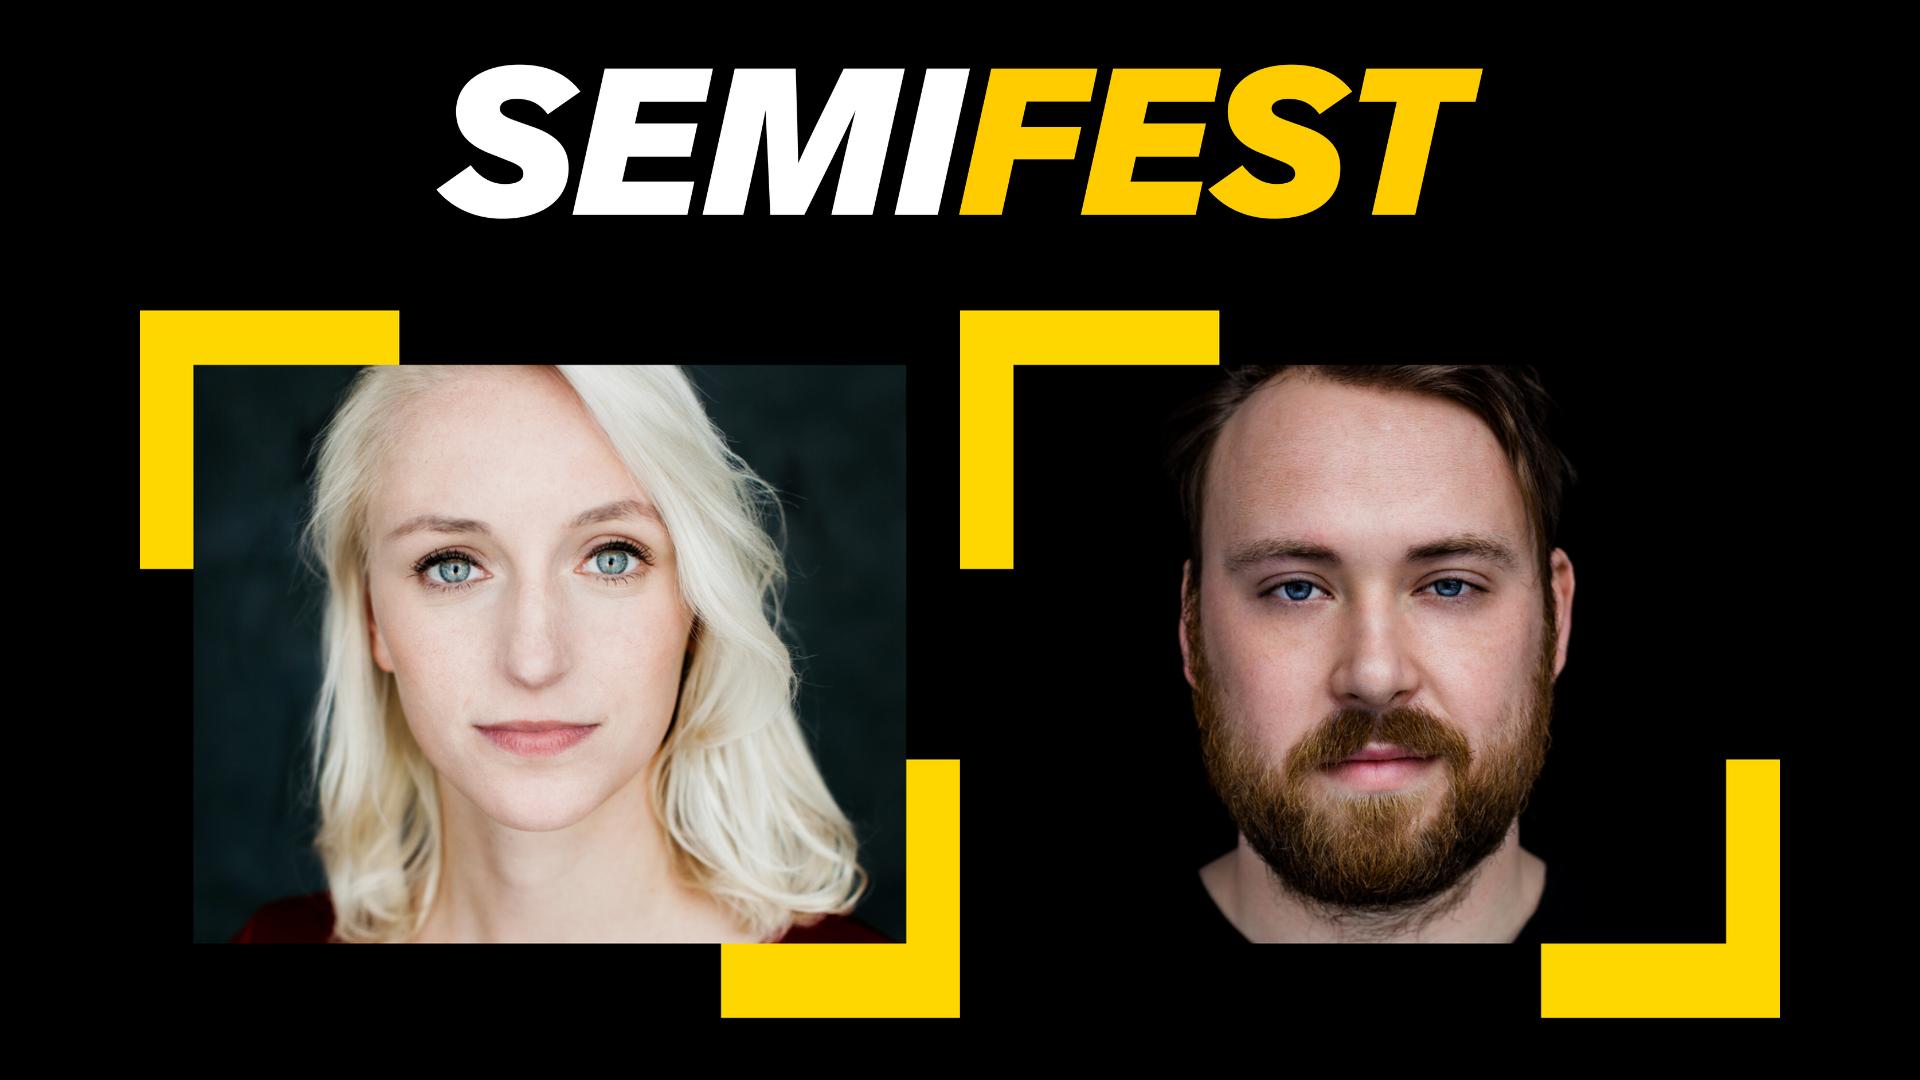 Semifest project collabburo